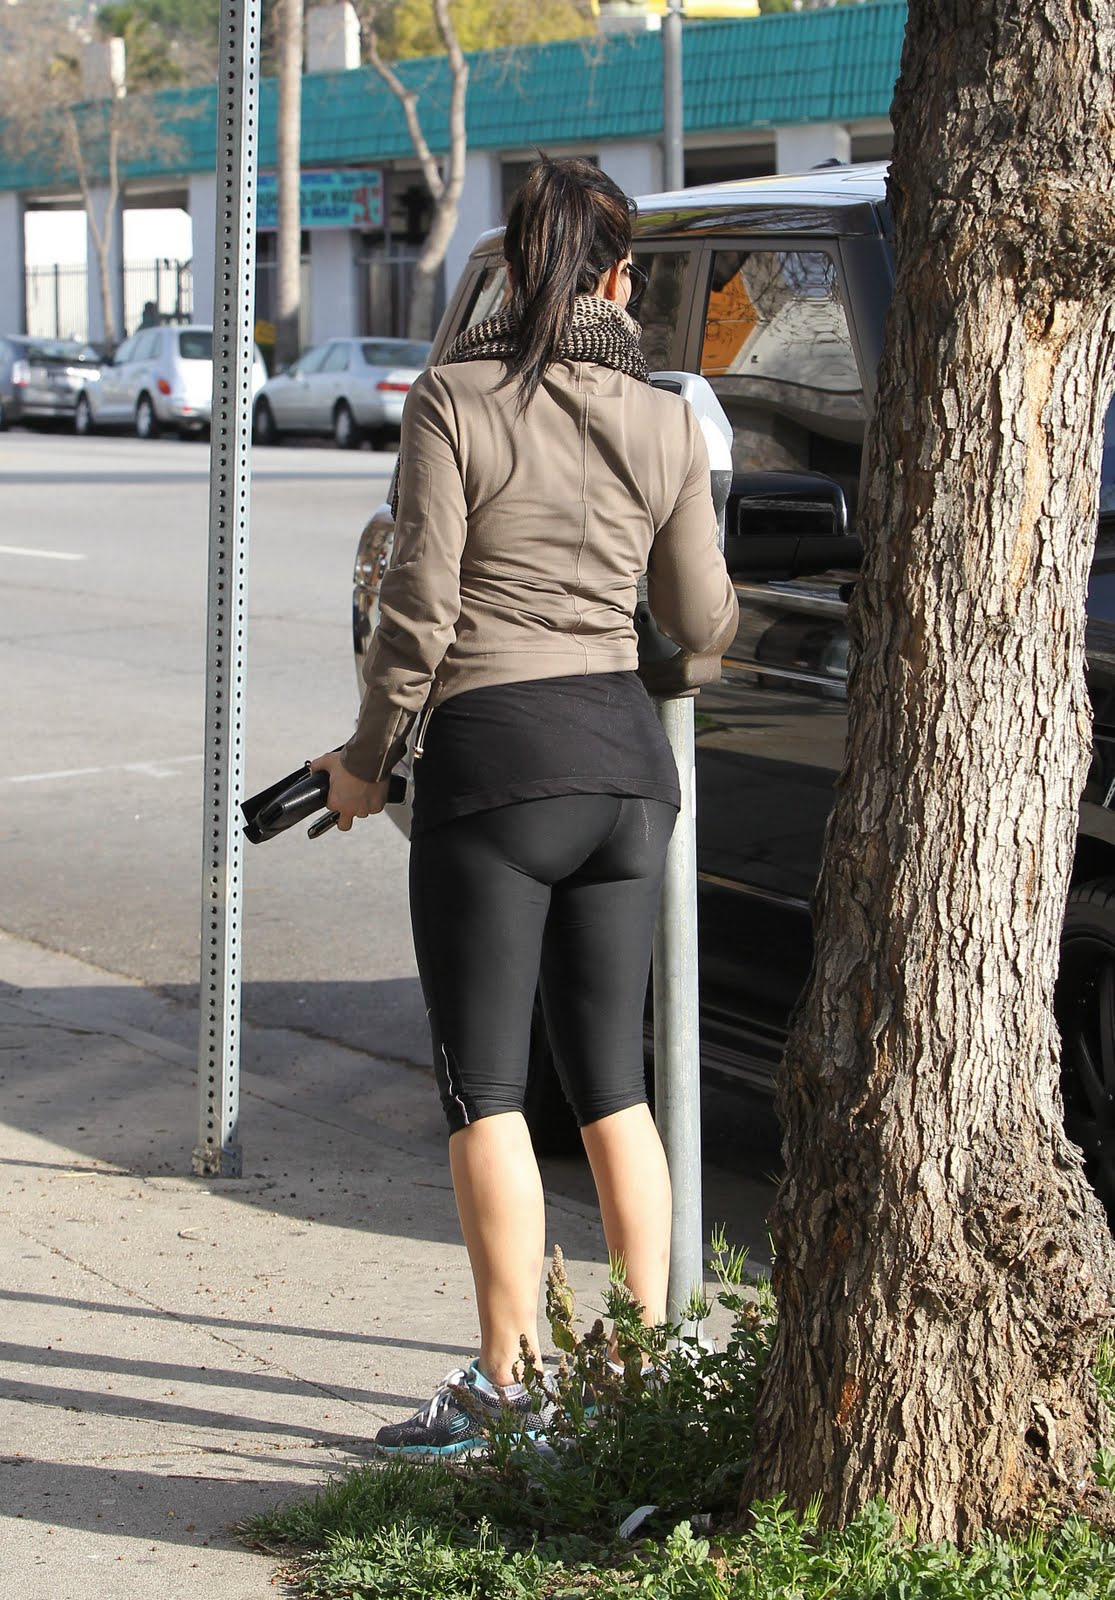 http://2.bp.blogspot.com/-goDt-Sc80bc/TX3as7_3K4I/AAAAAAAAHDc/HnSC9Ude_88/s1600/celebskin_kim_kardashian_ass_leggings_sportswear_candids_5.jpg